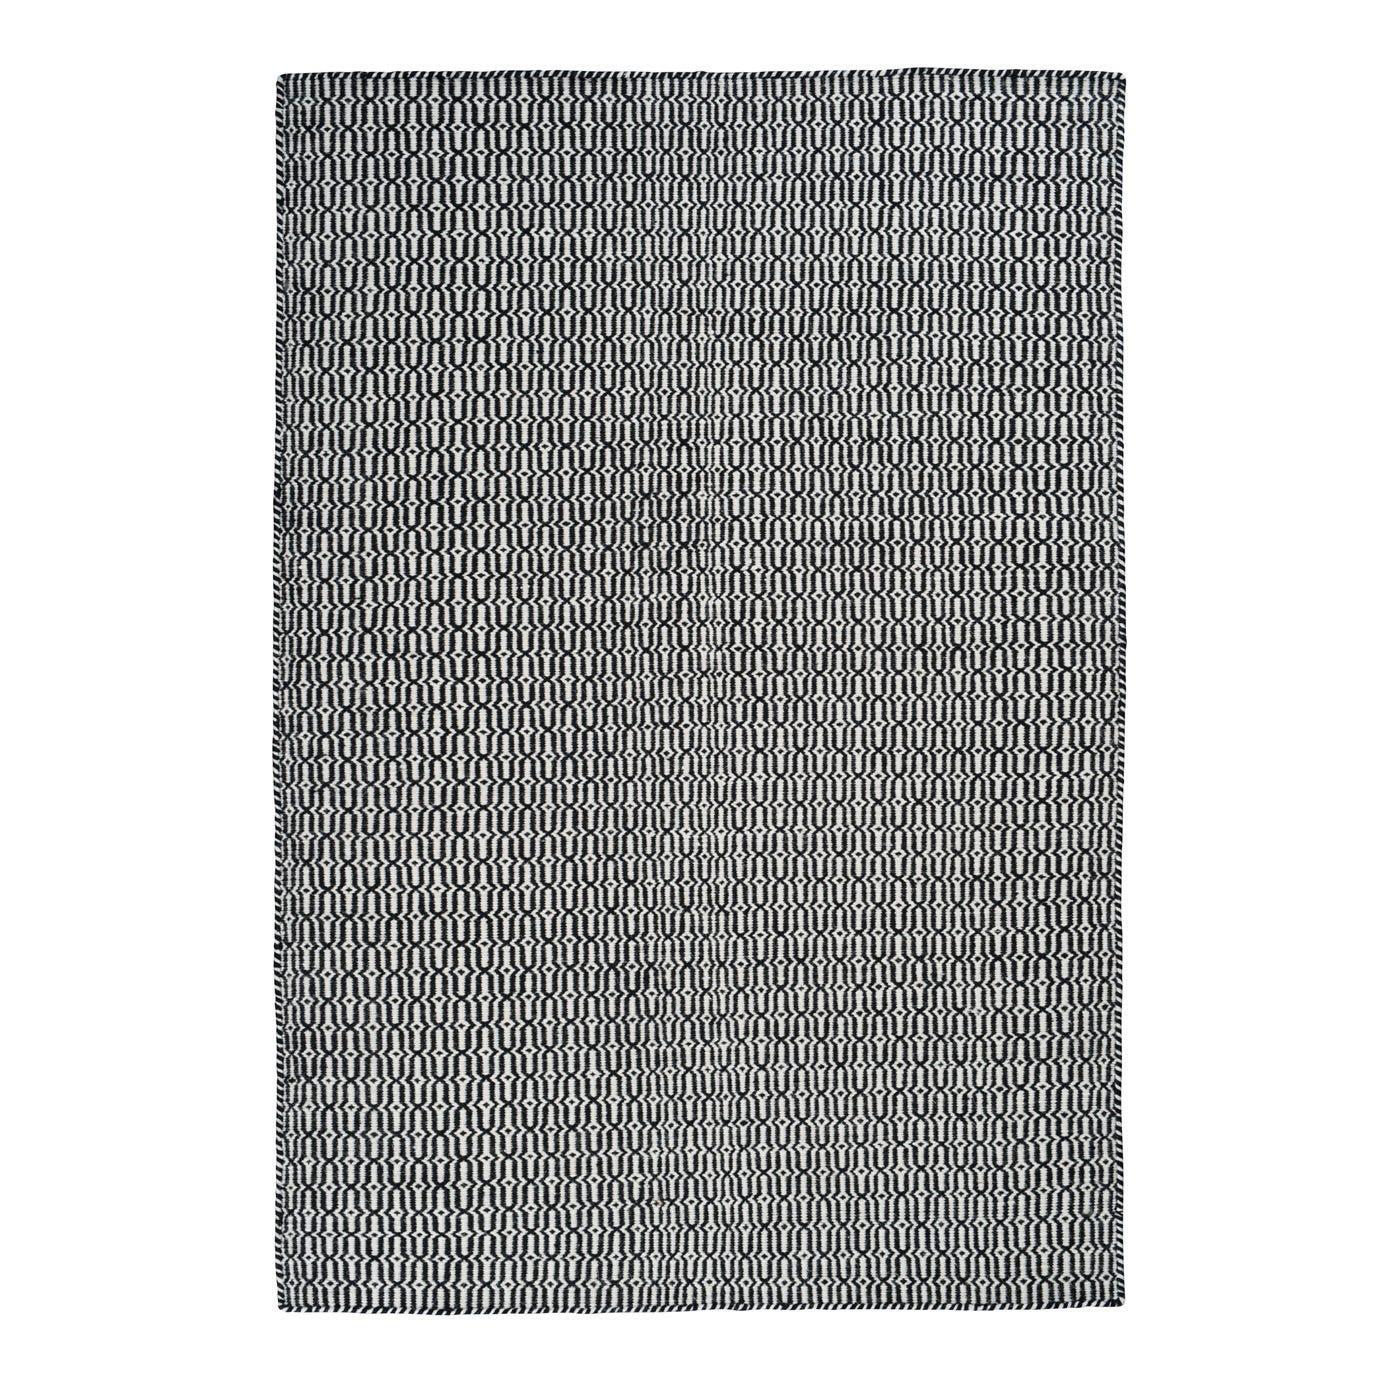 Linie Designs Tile Rug 200 x 300cm Black & White